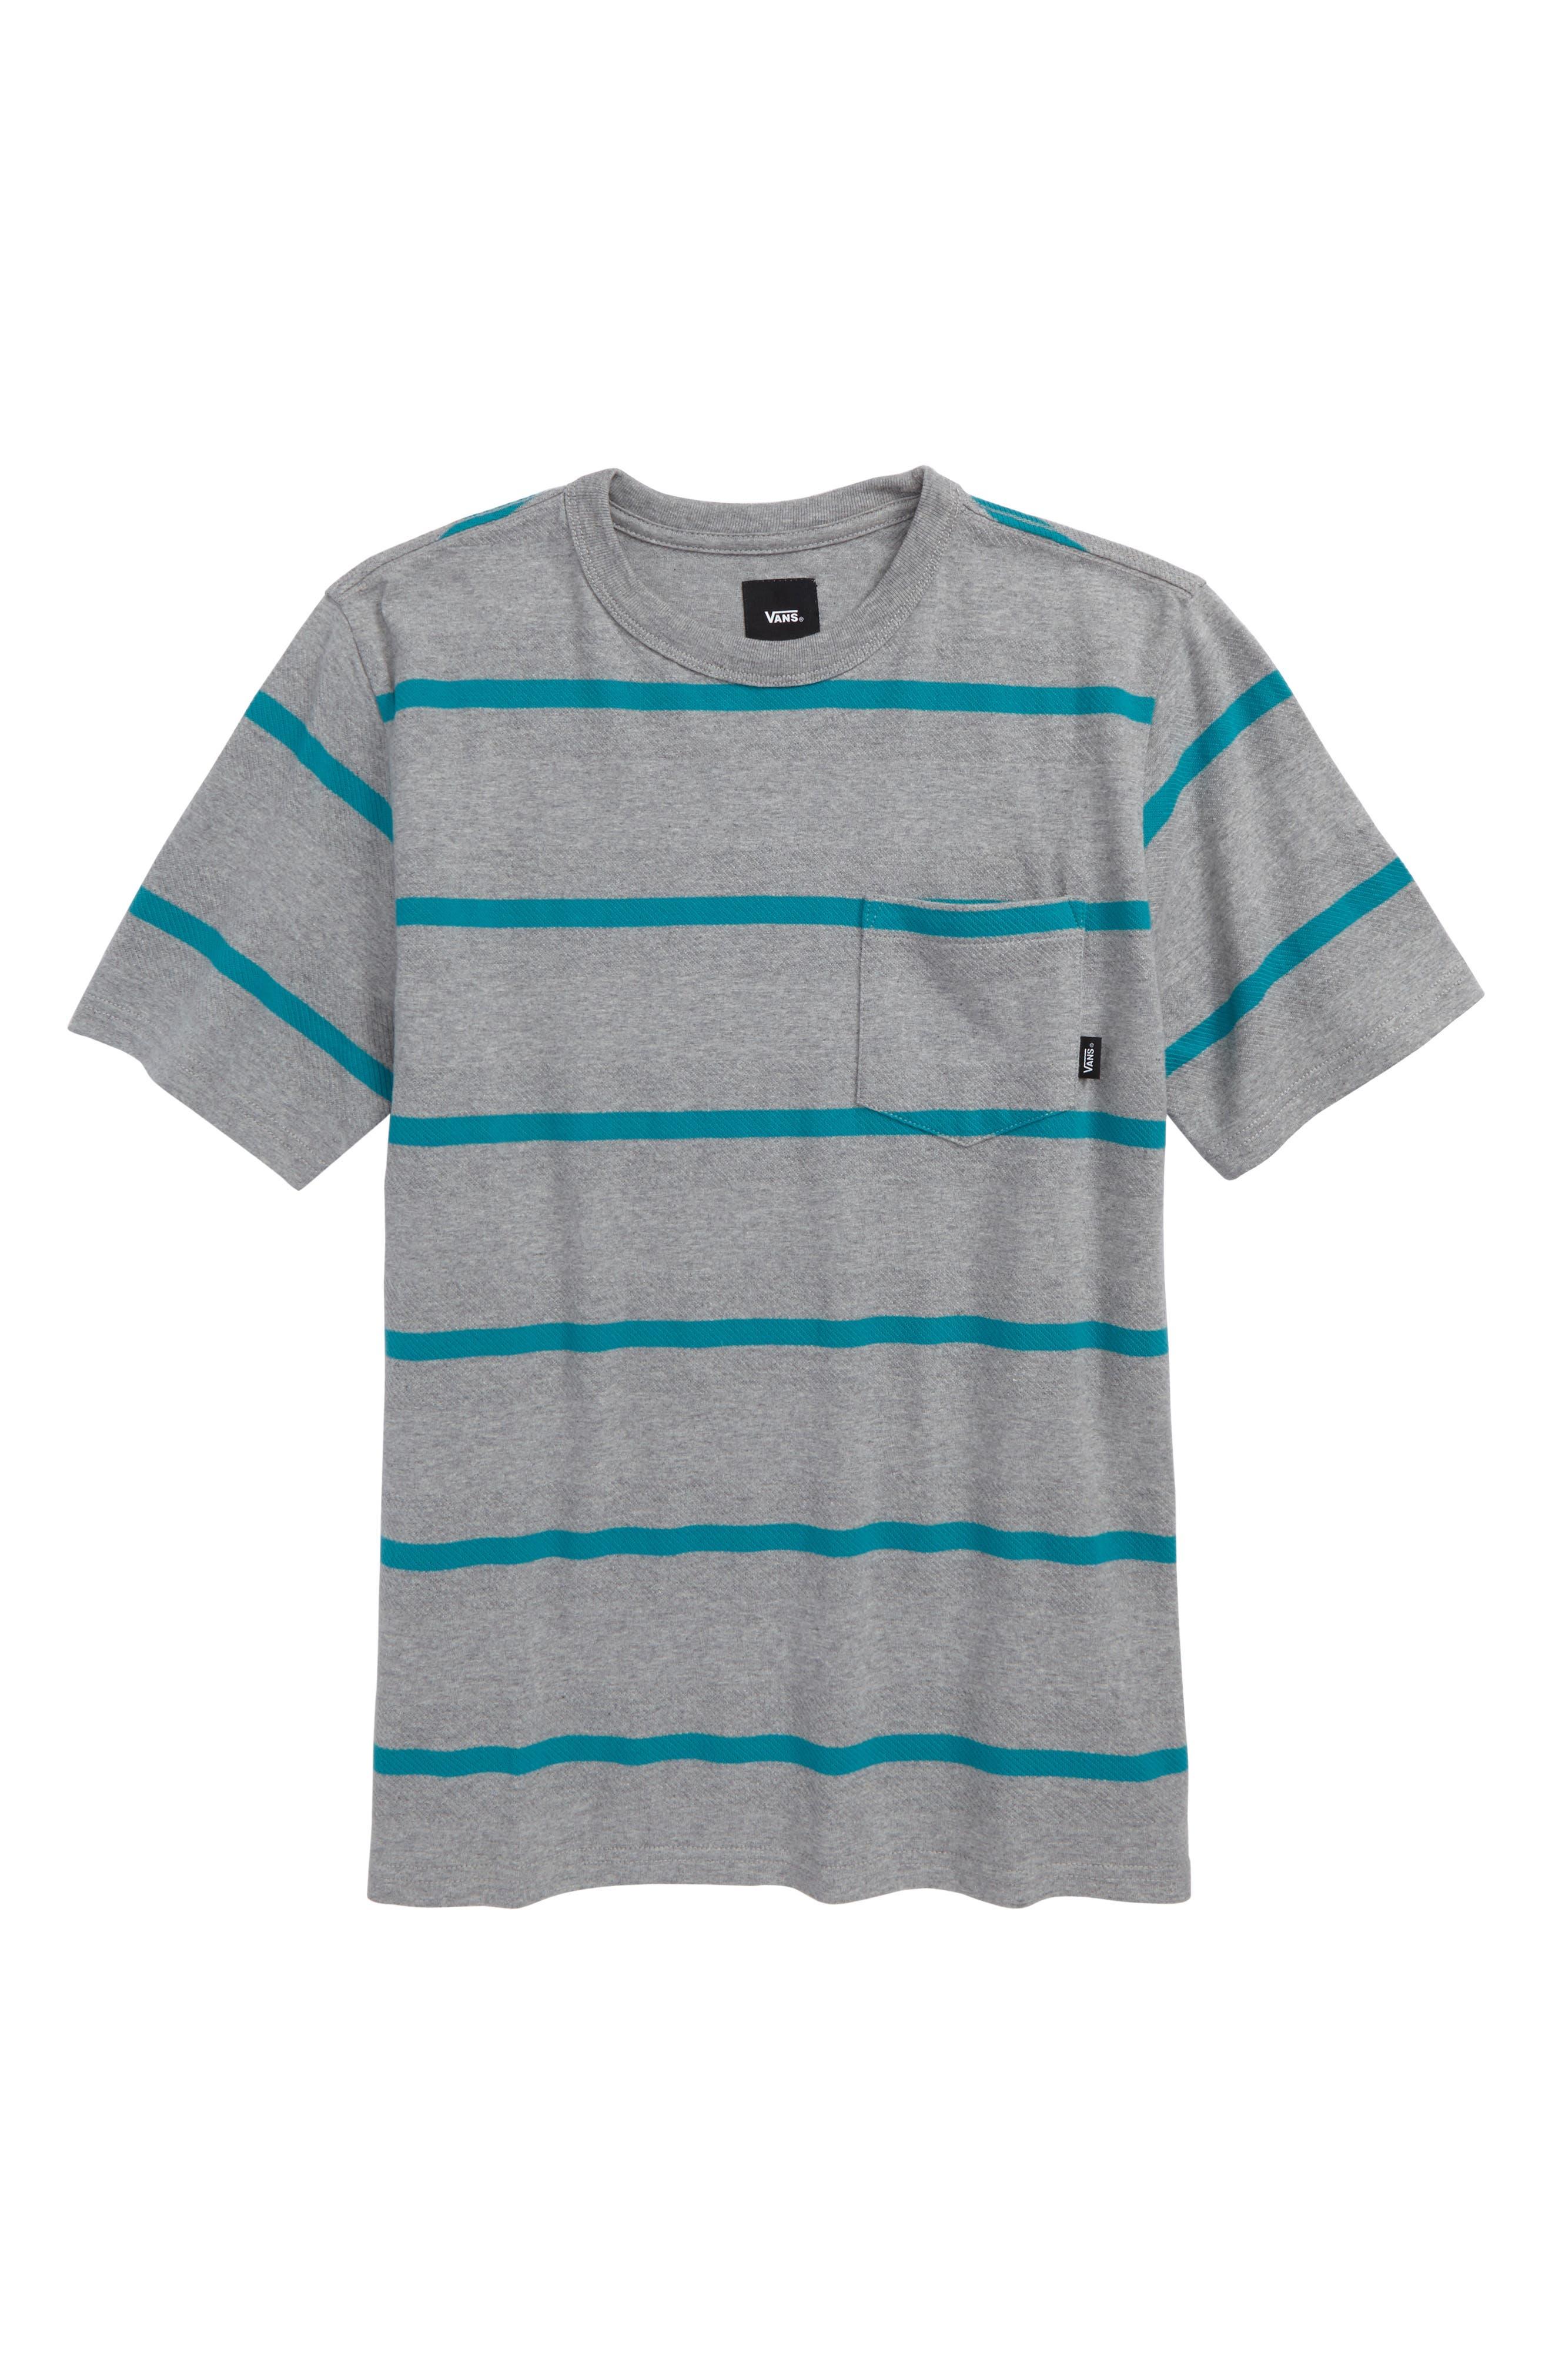 Chadron T-Shirt,                         Main,                         color, 030